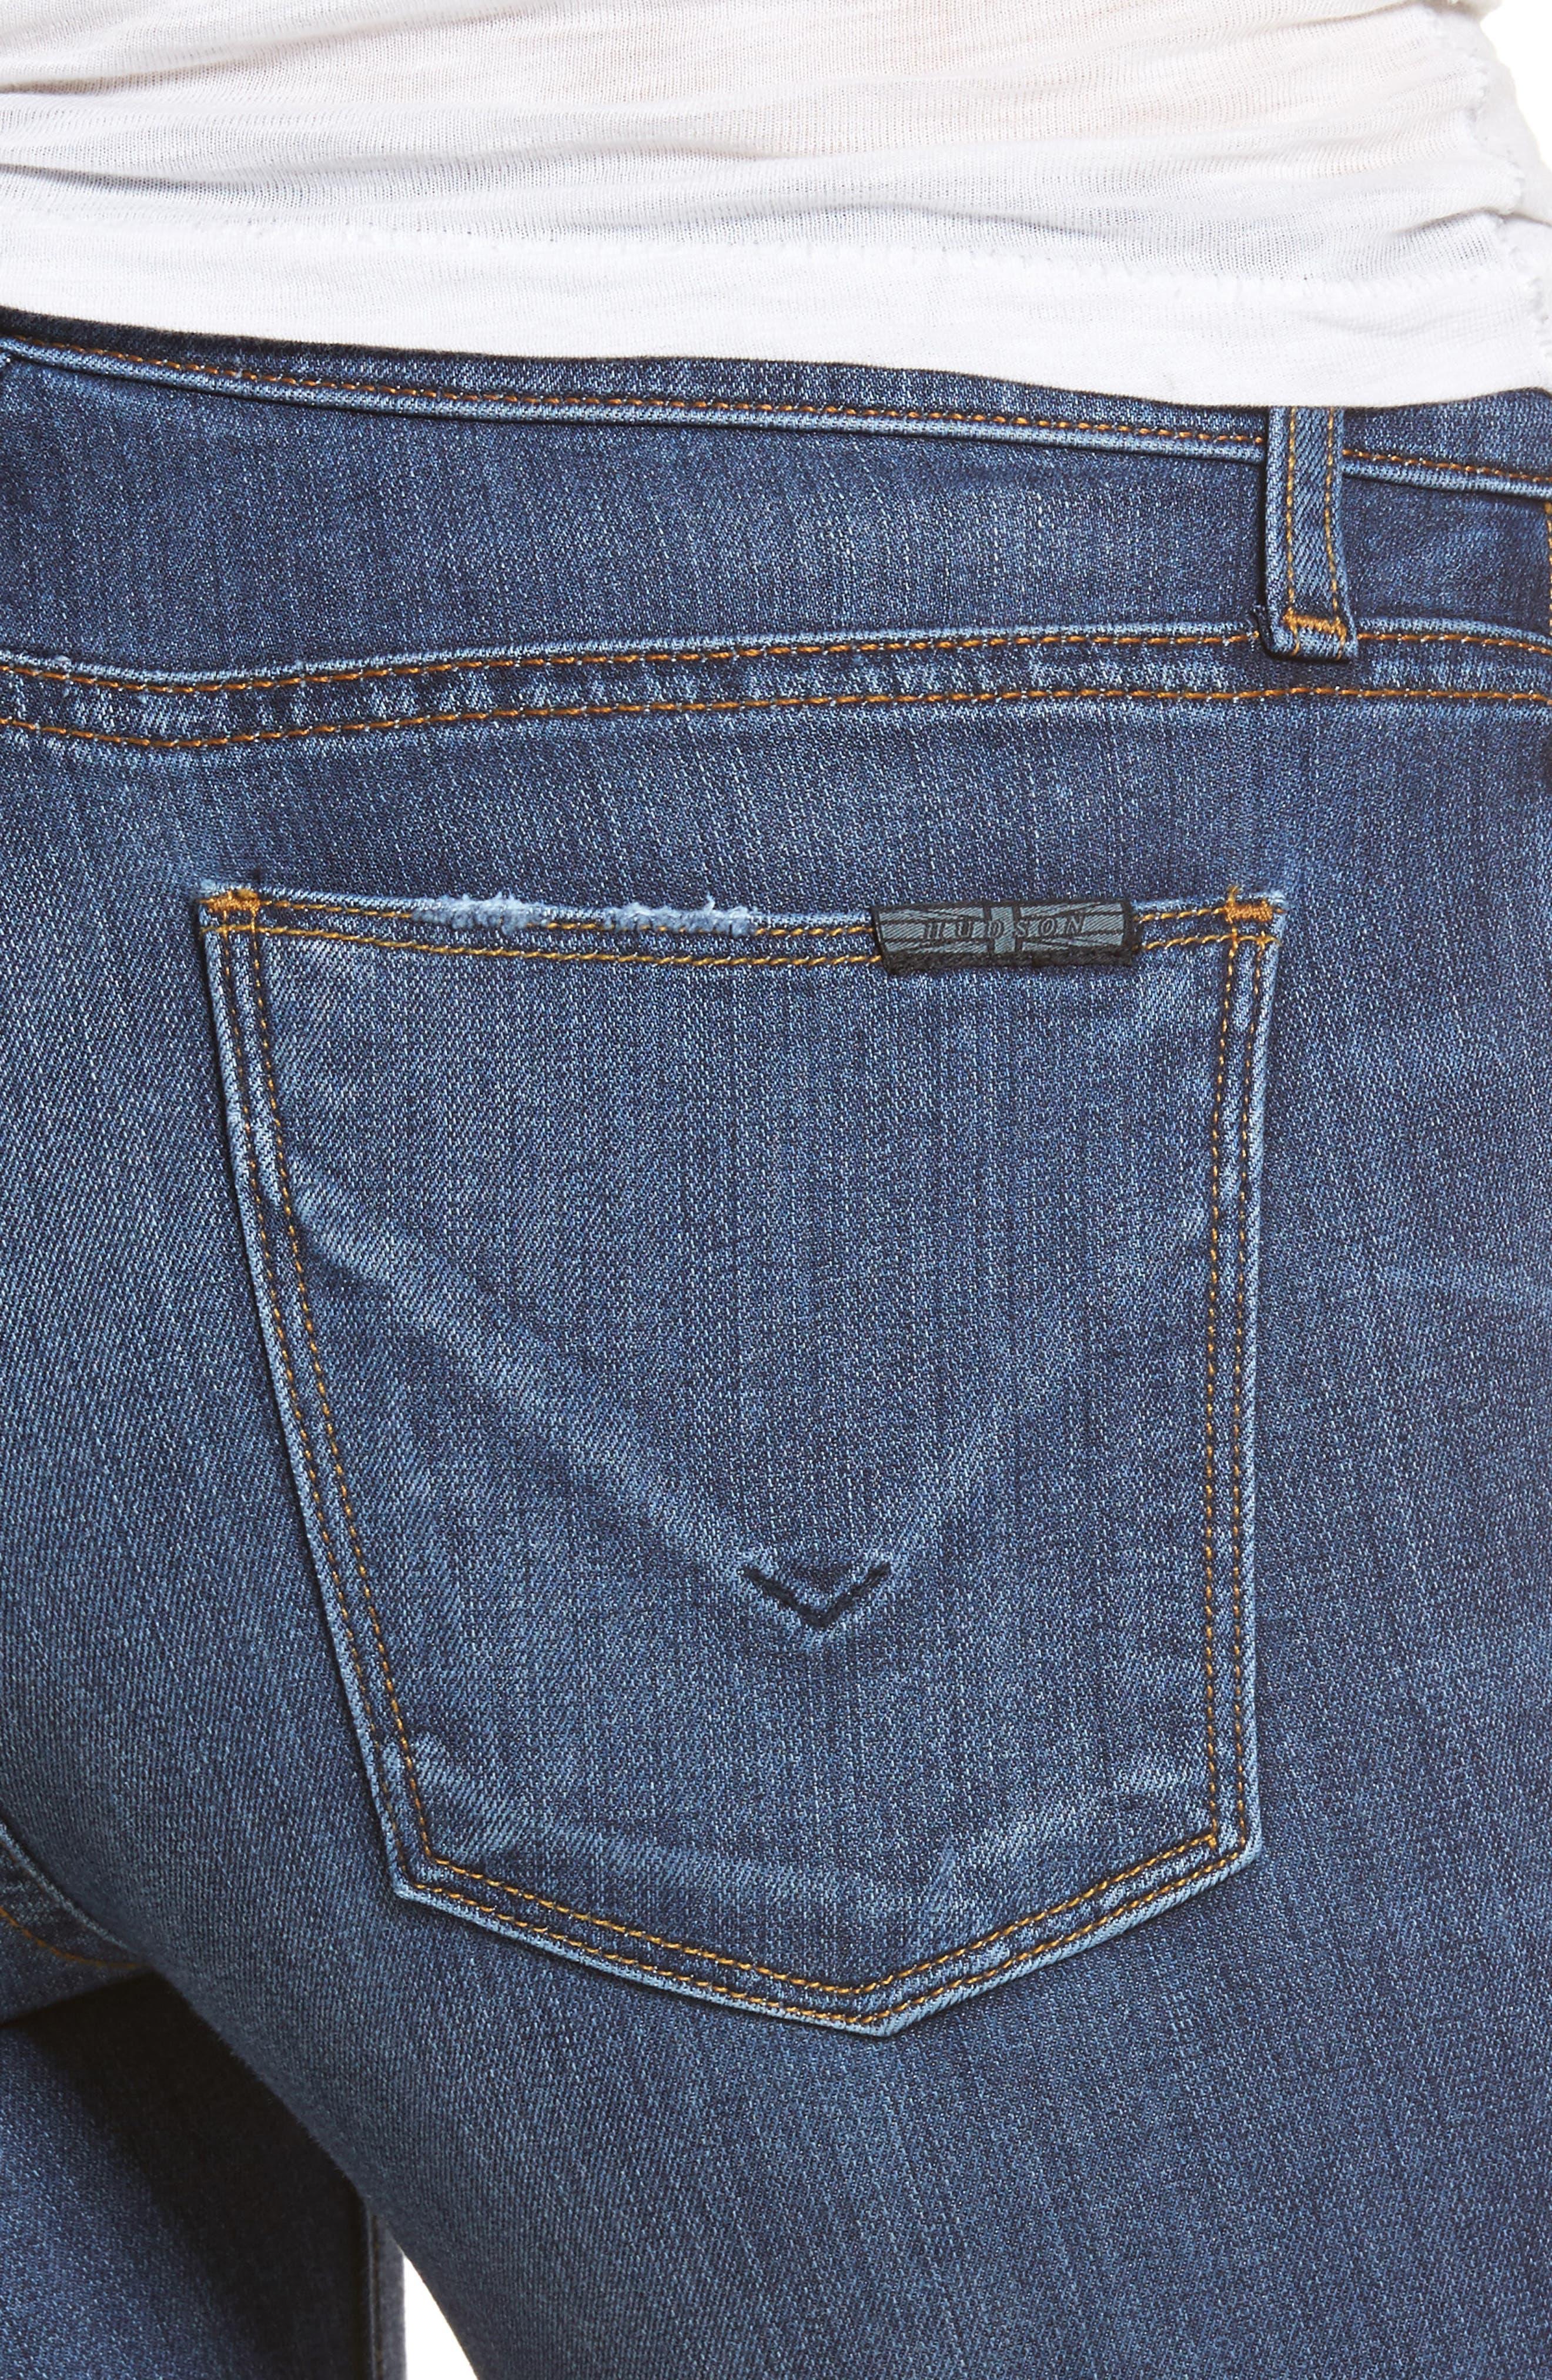 'Krista' Super Skinny Jeans,                             Alternate thumbnail 15, color,